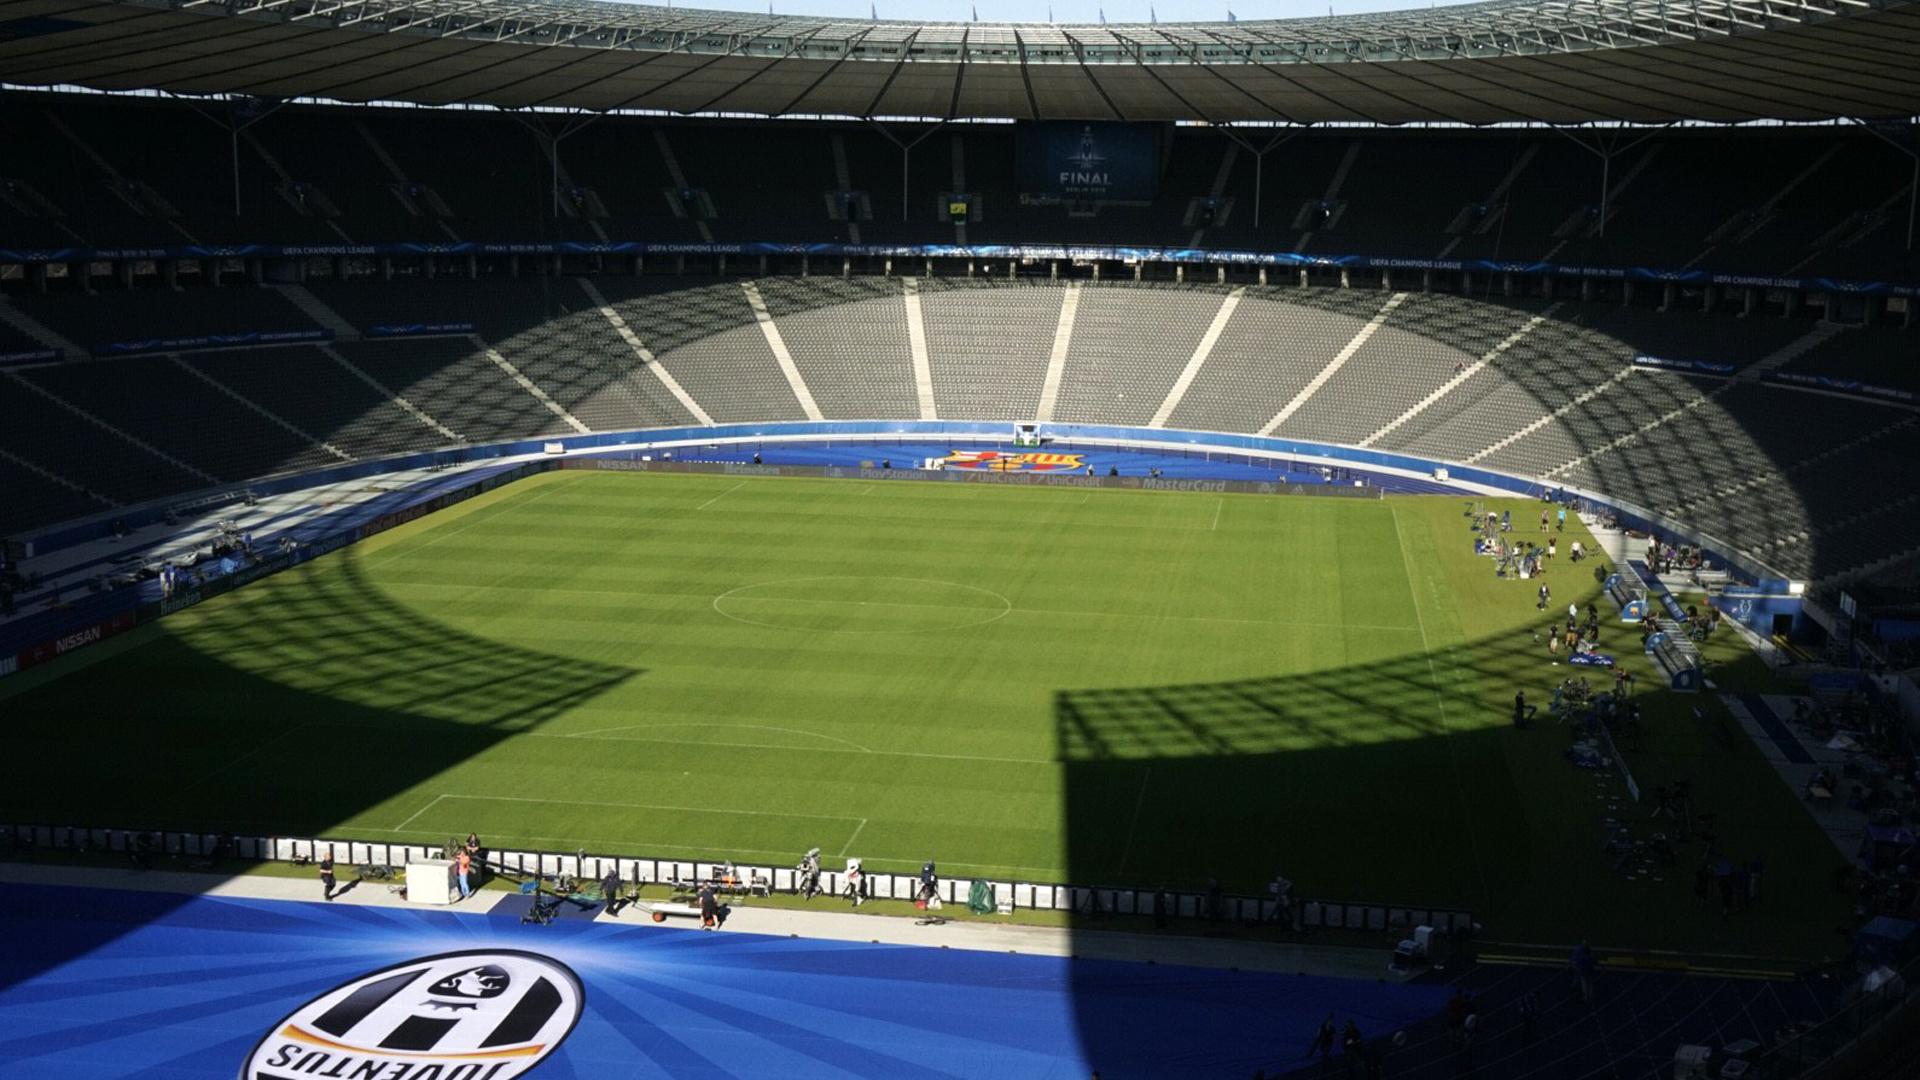 Olympiastadion Berlin Olympiastadium Champions League Juventus Barcelona  06052015 9ed24221489ad